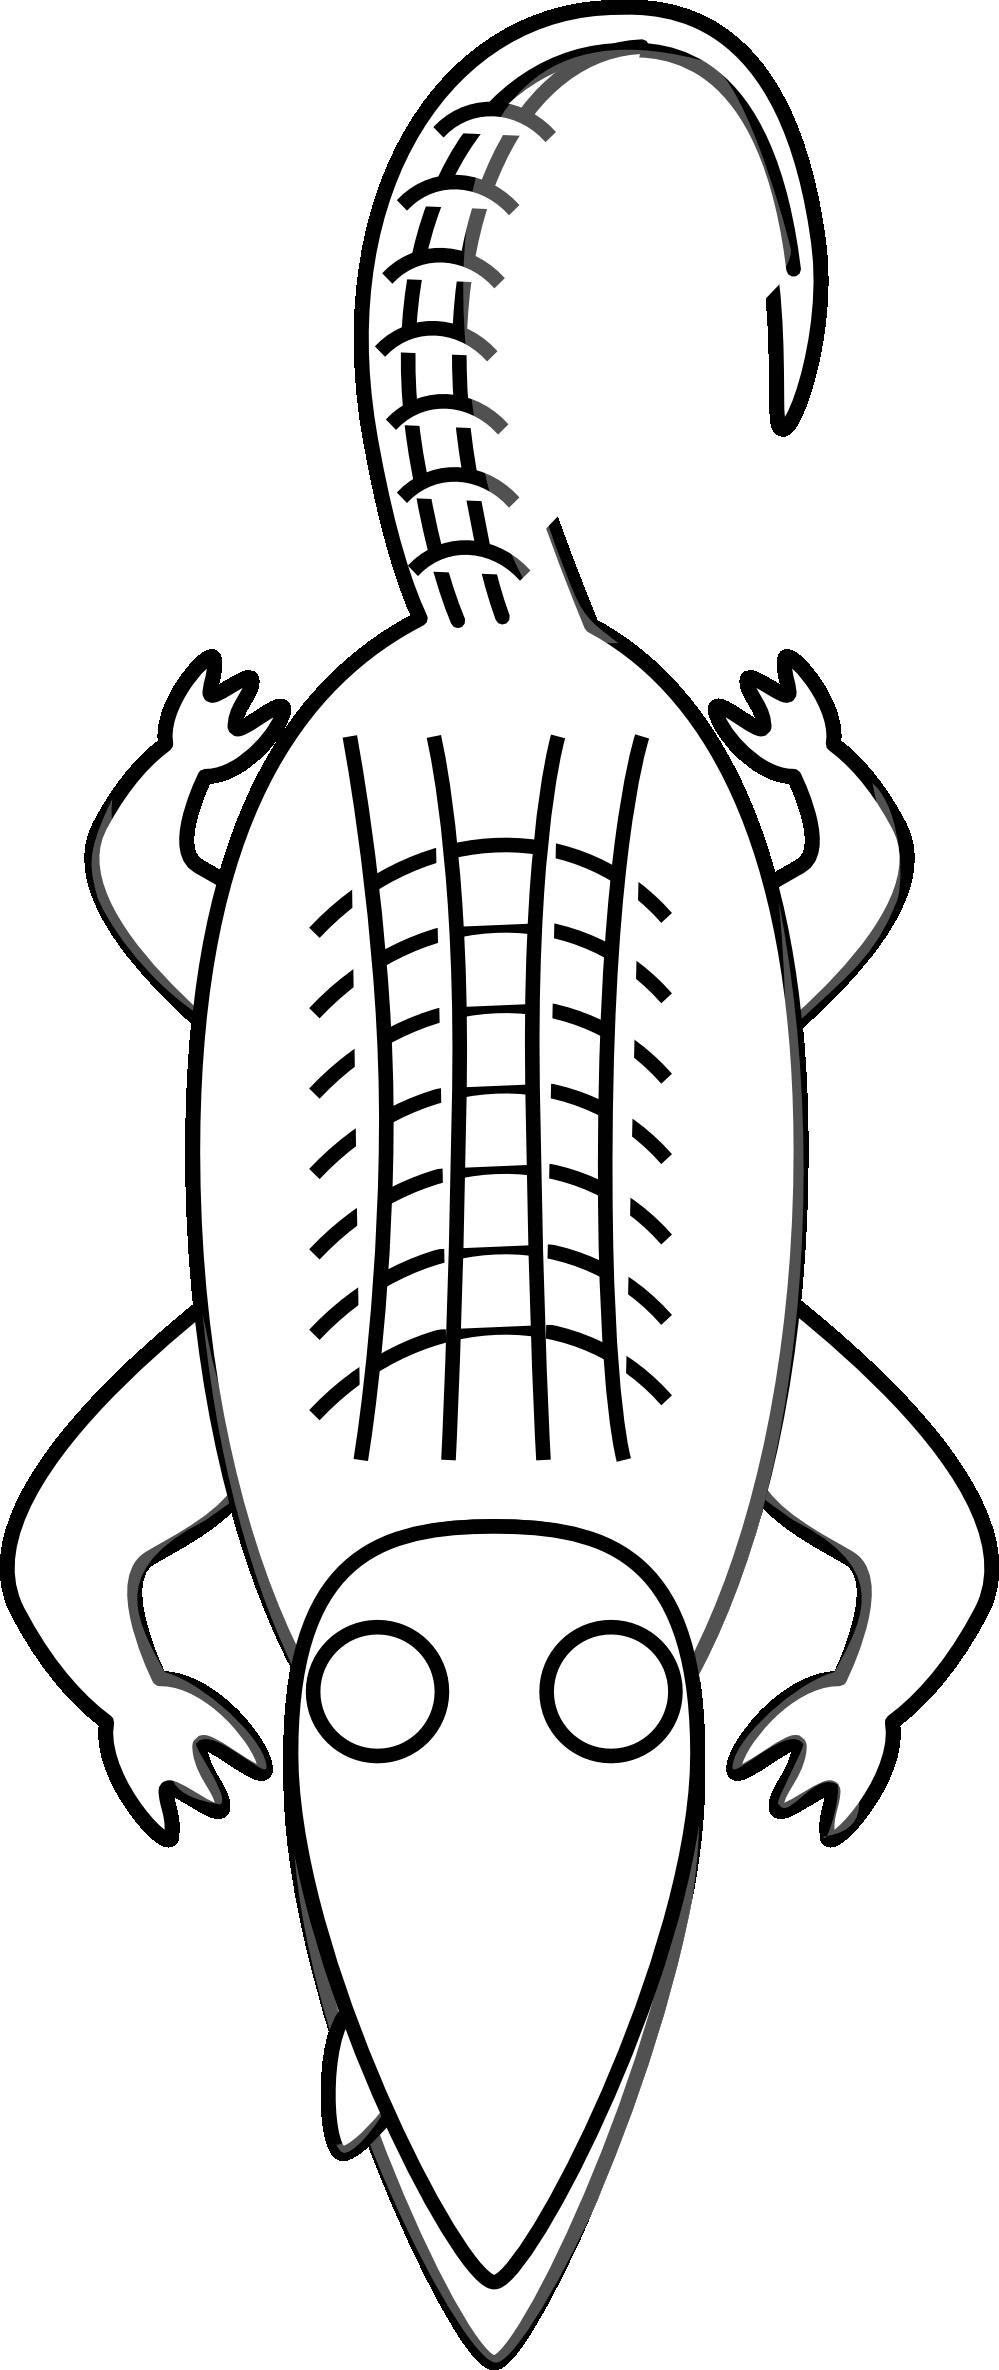 Halloween alligator clipart clip art black and white Alligator Clipart Black And White   Clipart Panda - Free Clipart Images clip art black and white